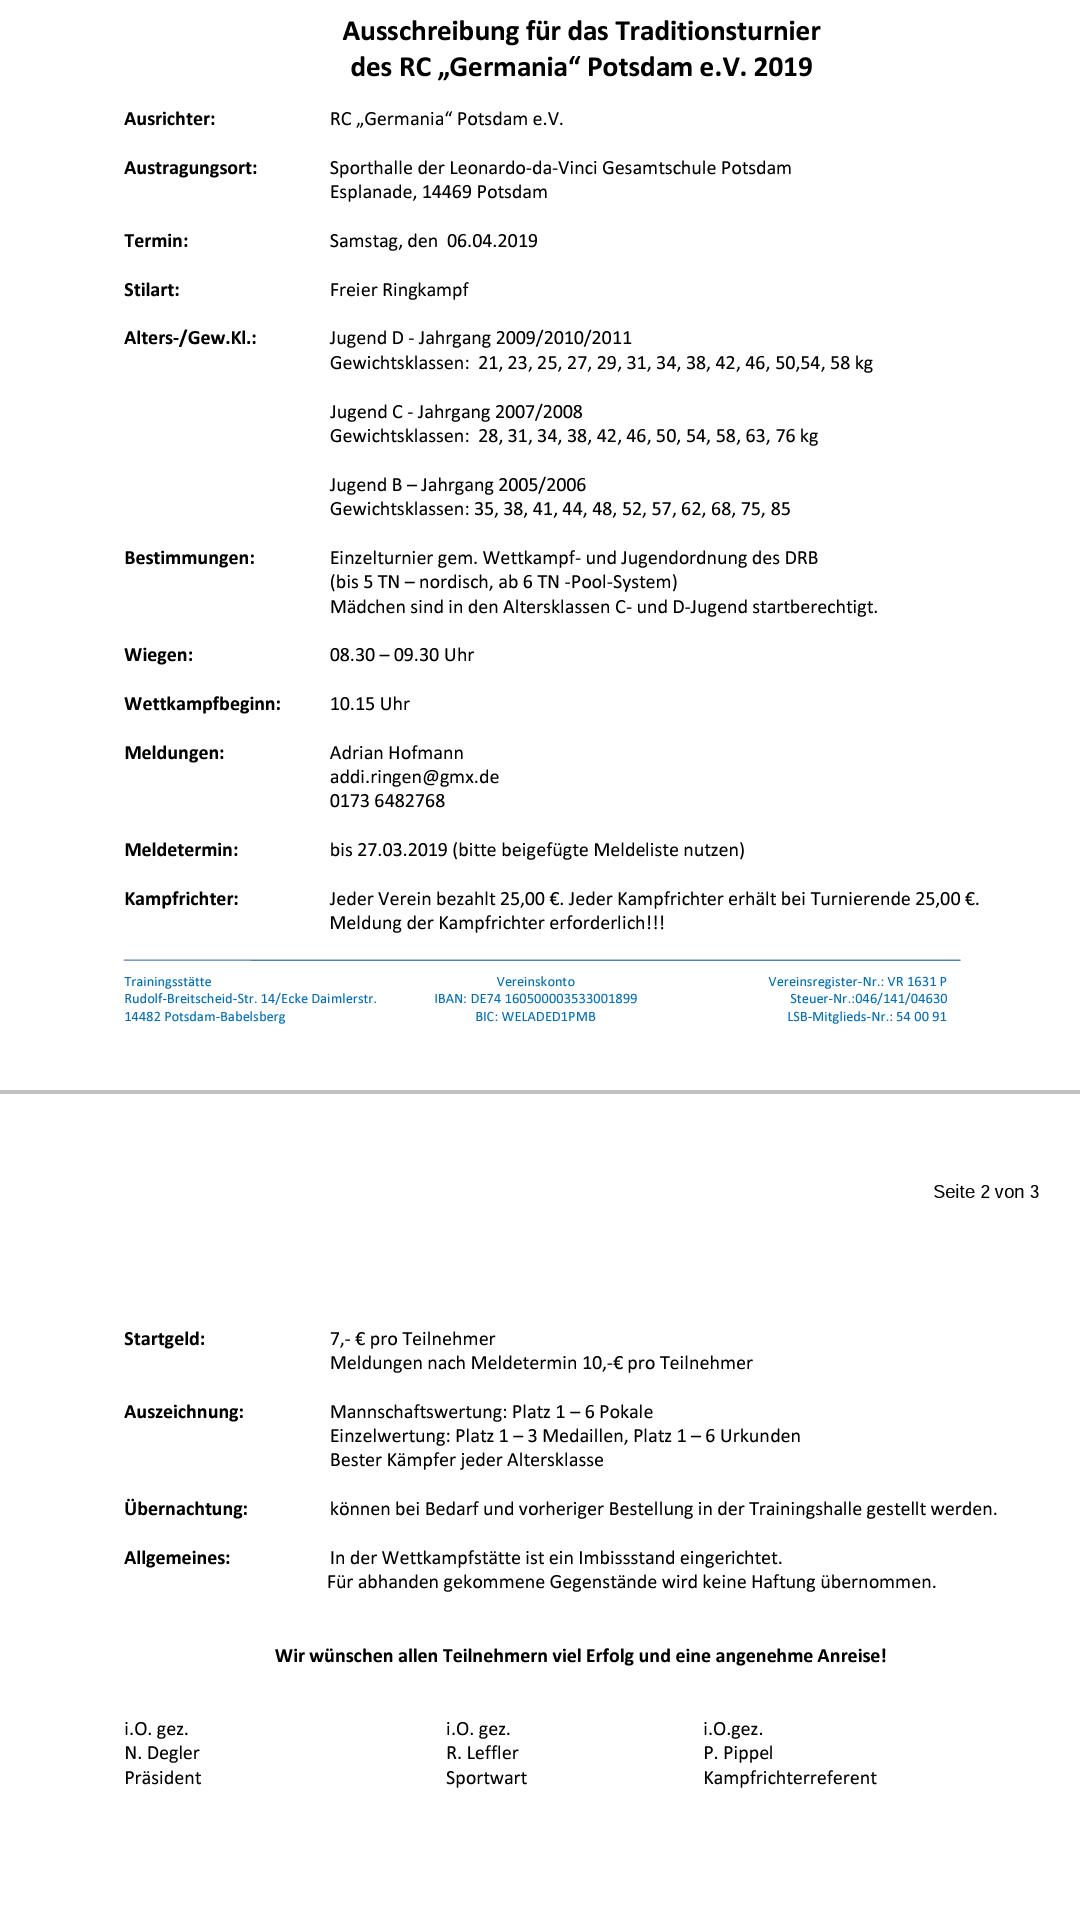 Traditionsturnier Potsdam 2019